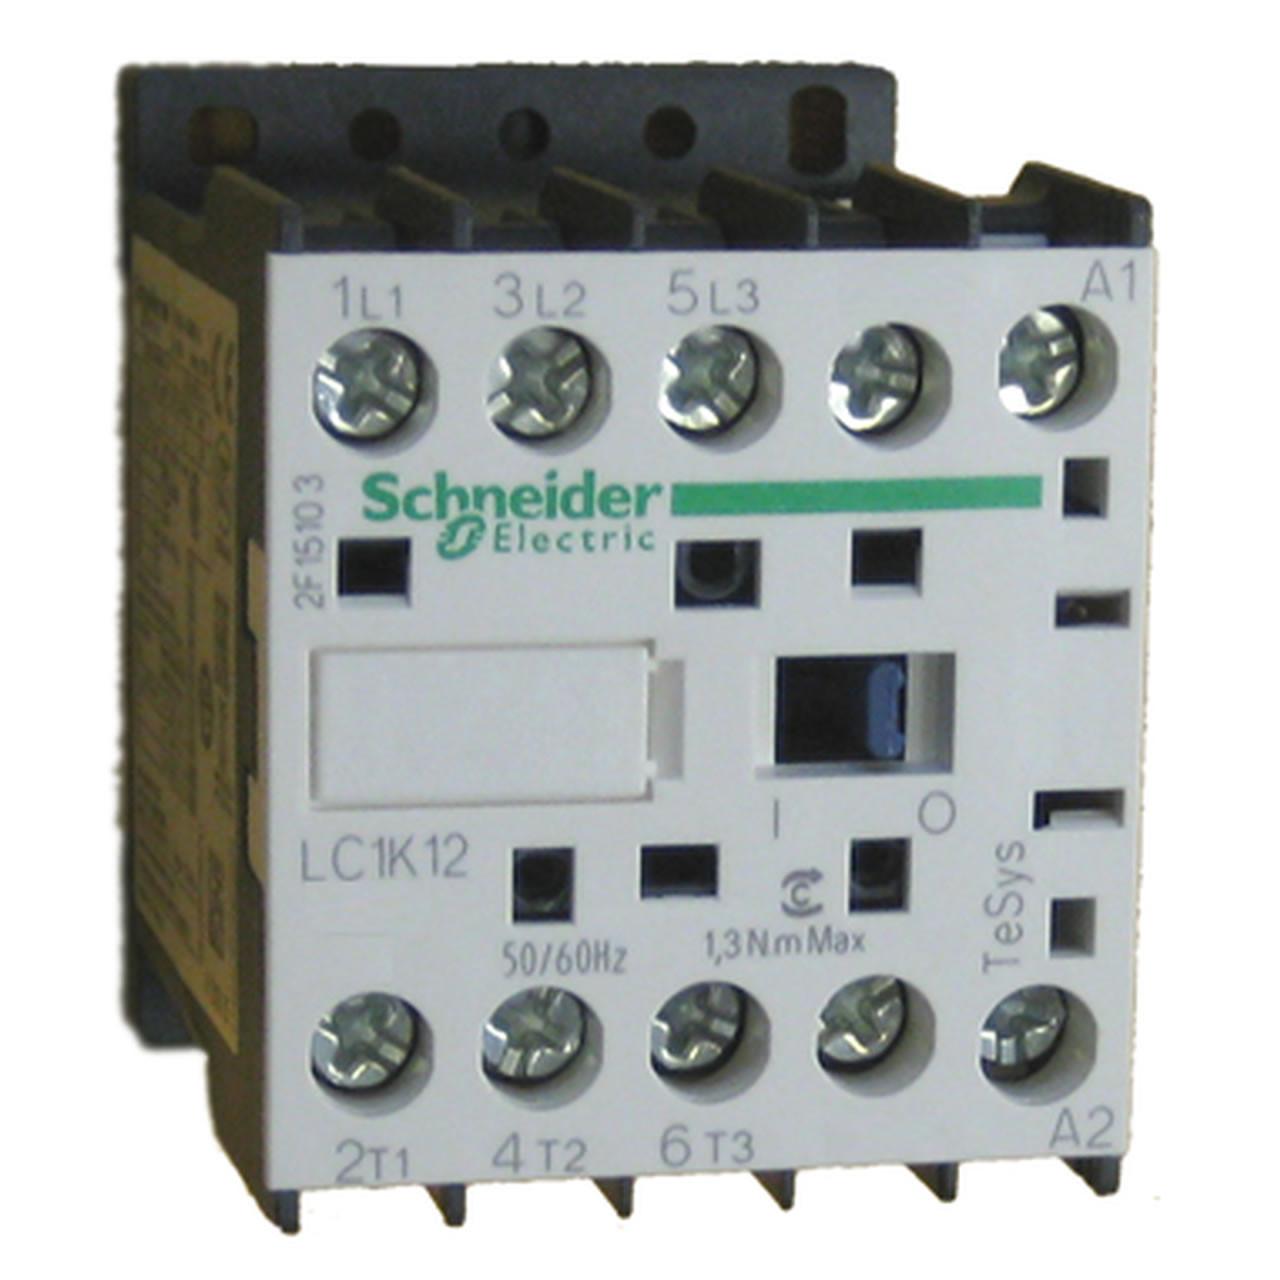 Schneider Electric LC1K1201R7 contactor